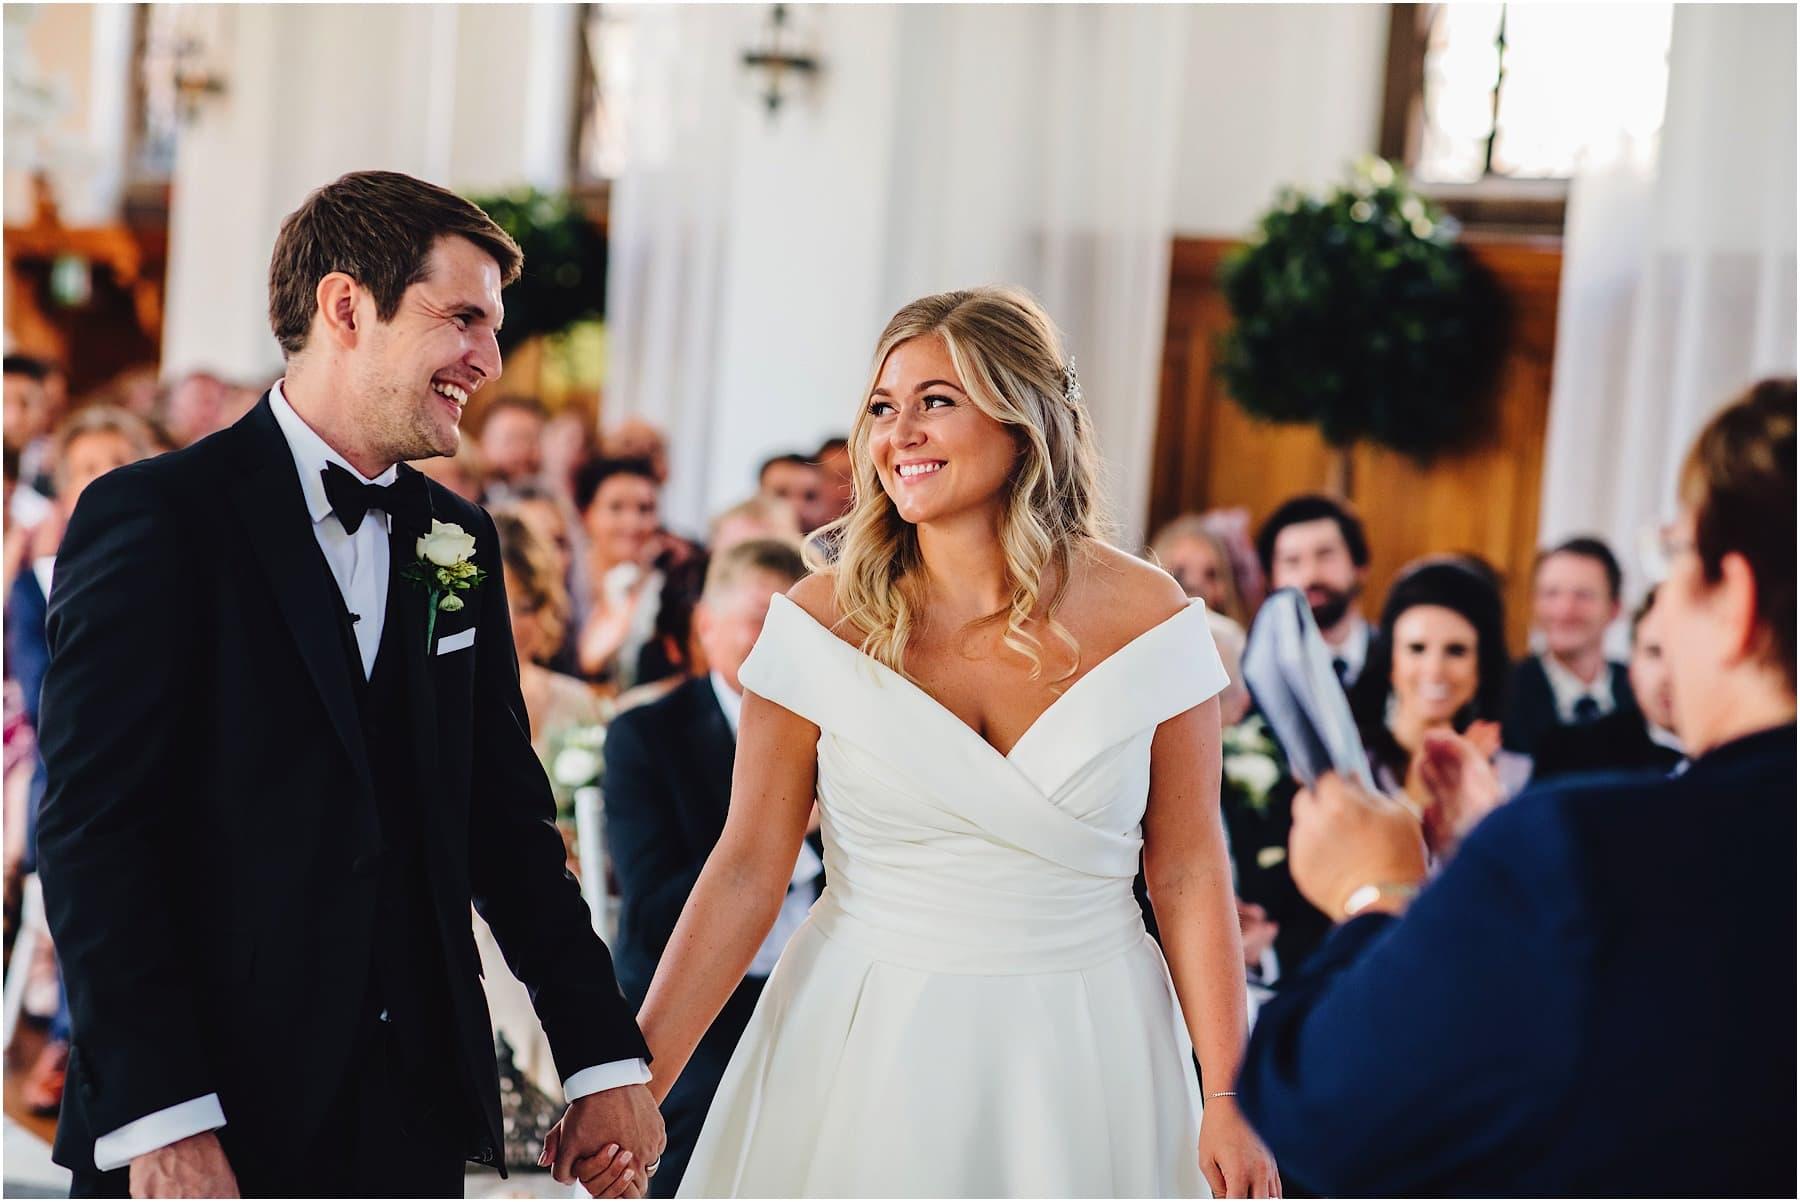 bride and groom happy at wedding ceremony